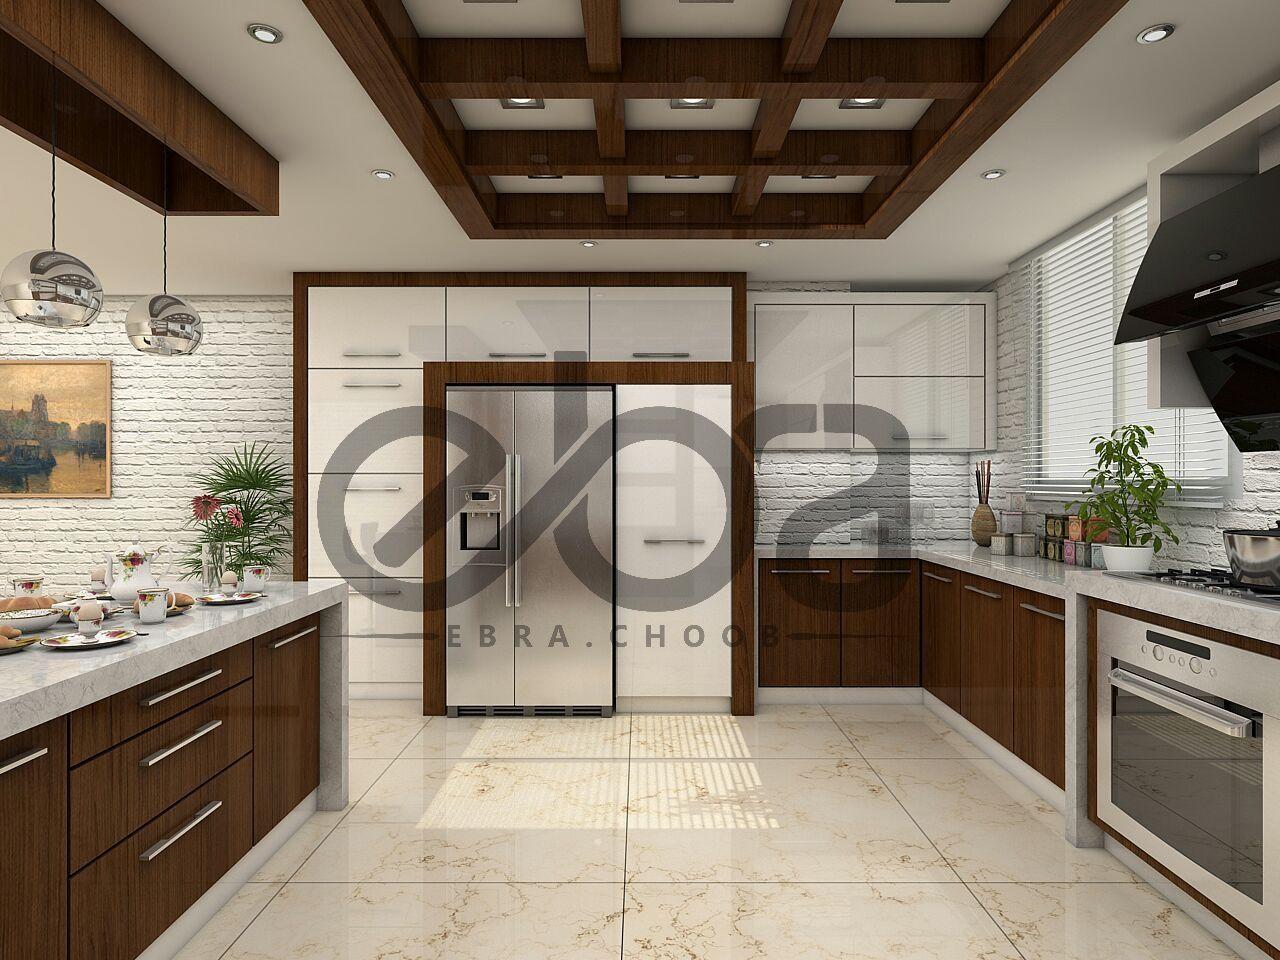 Ebrachoob Kitchen In 2020 Home Decor Kitchen Home Appliances Kitchen Cabinets